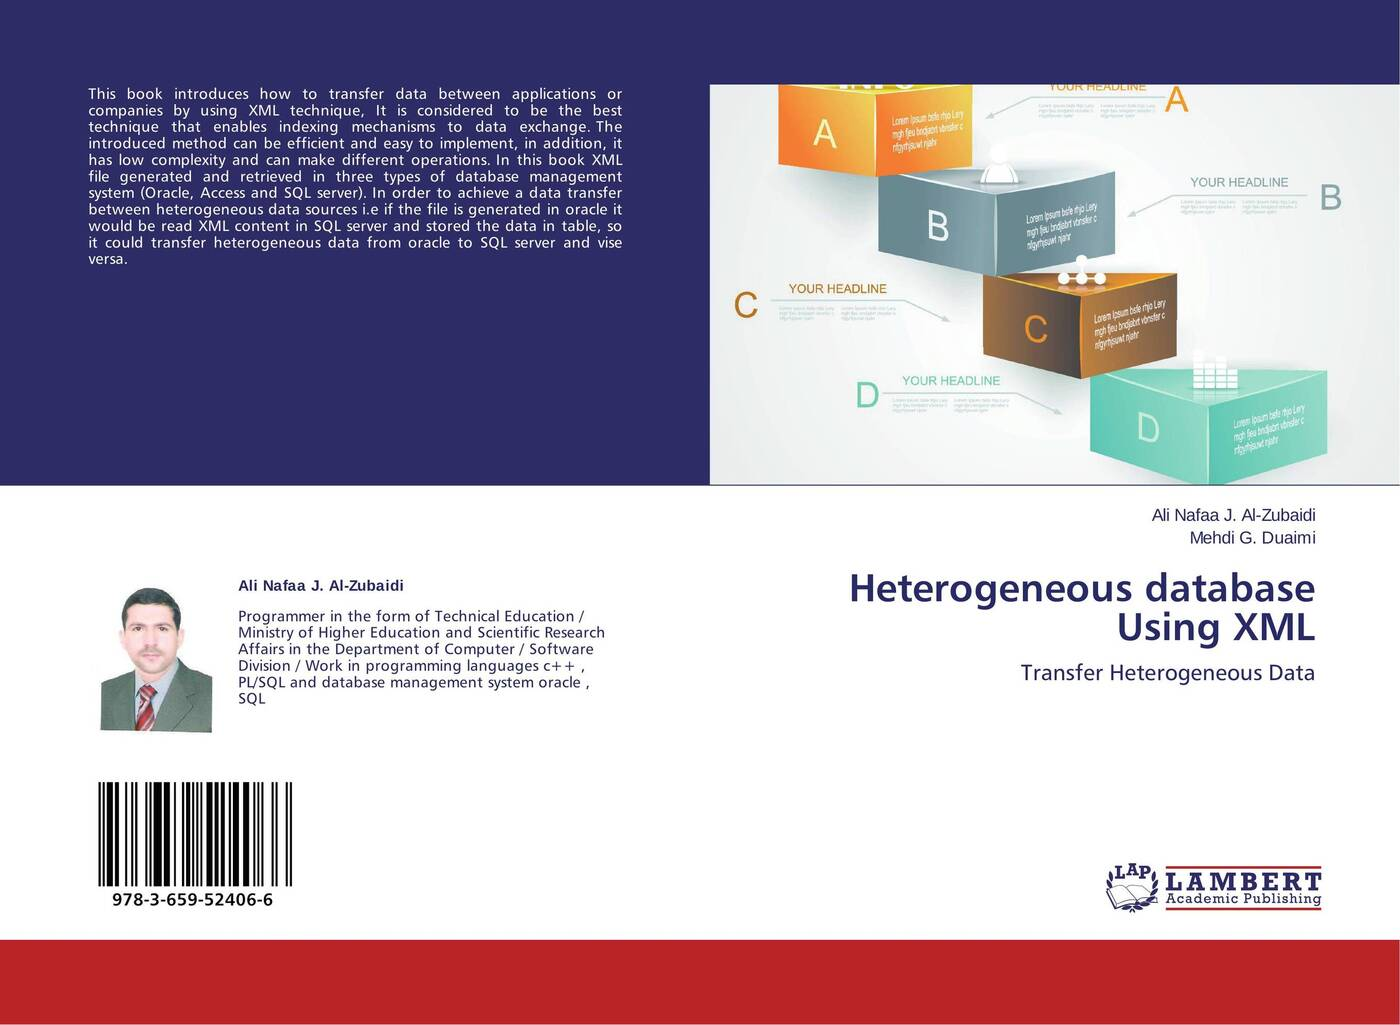 Ali Nafaa J. Al-Zubaidi and Mehdi G. Duaimi Heterogeneous database Using XML sitemap 165 xml